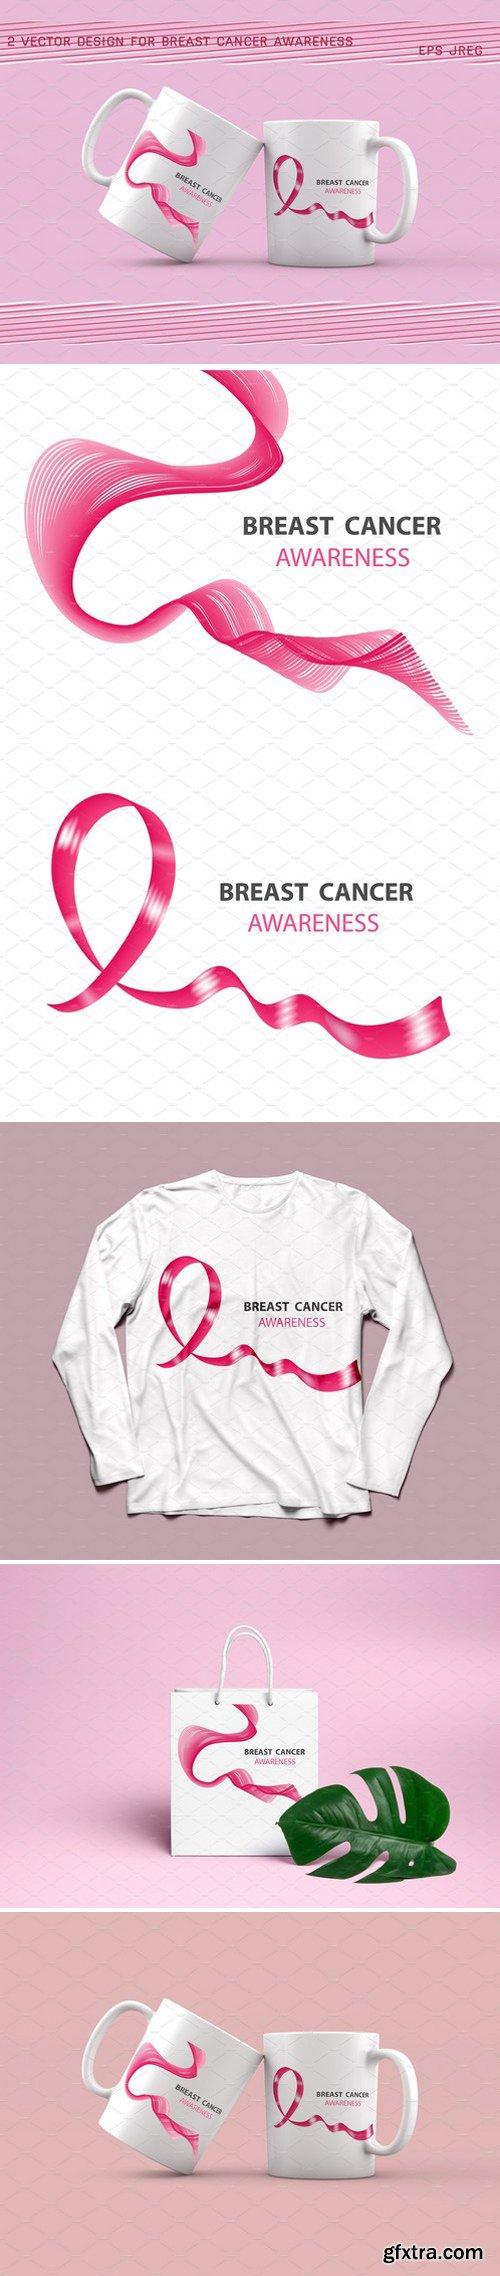 CM - Breast Cancer Awareness design 1851641